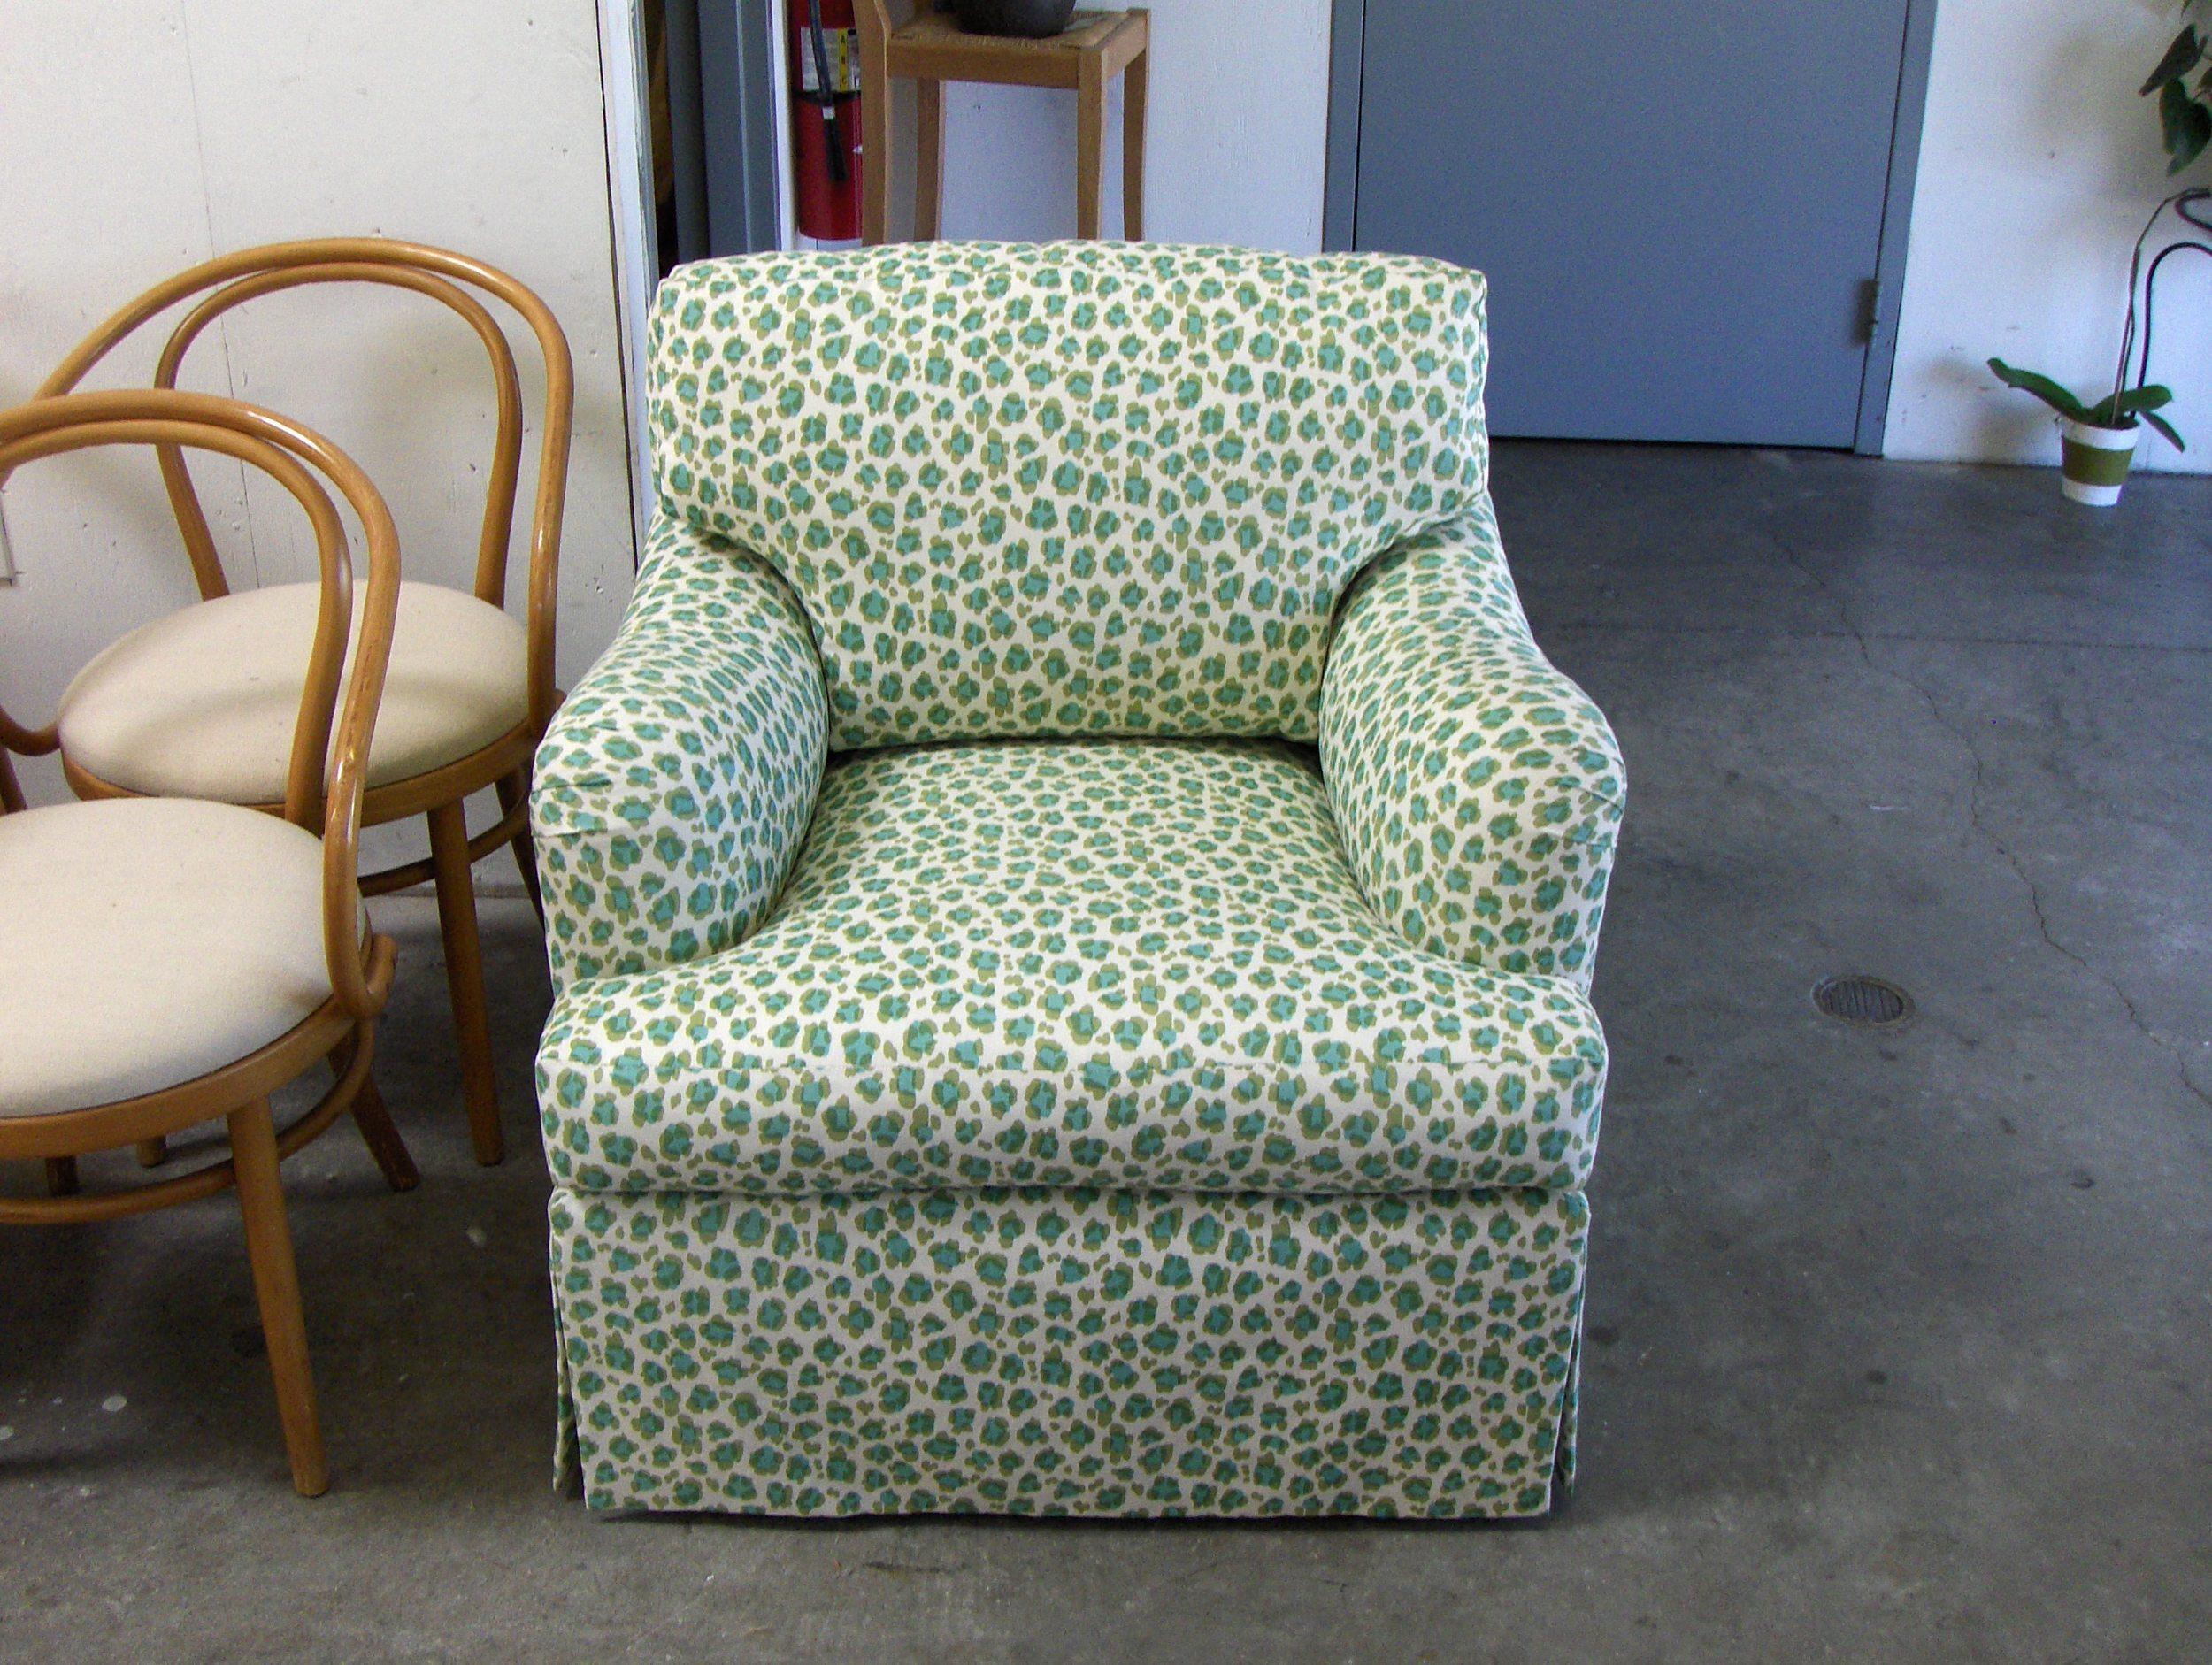 Chair  Cotton print w/ drop skirt